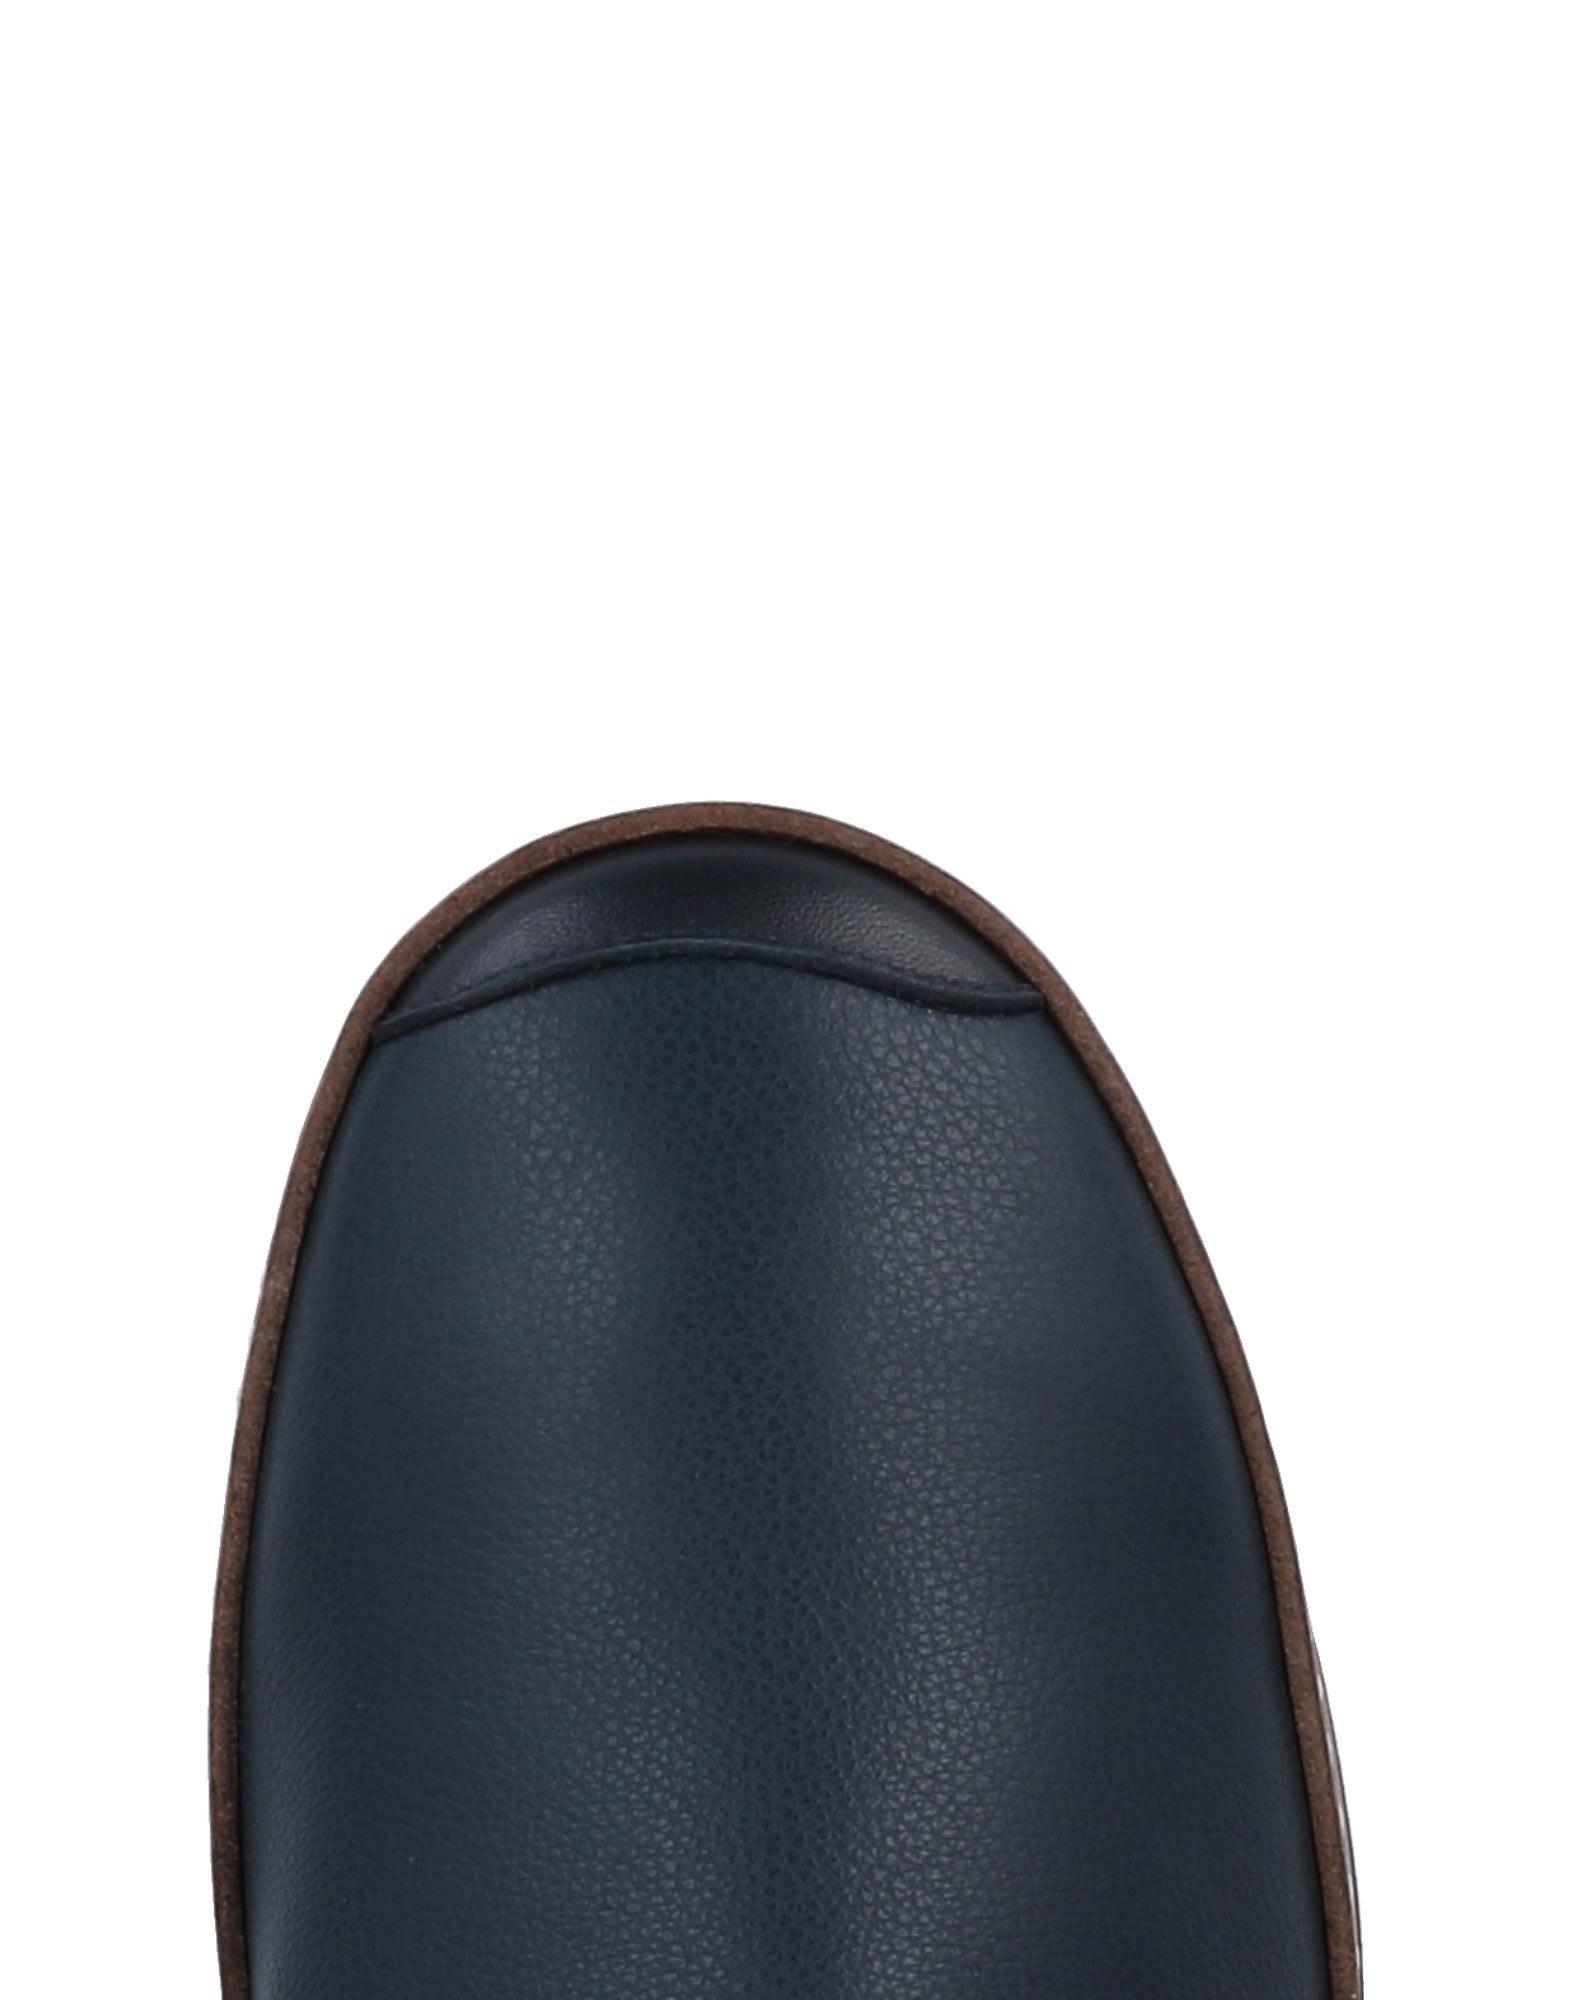 Henderson Sneakers Herren beliebte  11452346WW Gute Qualität beliebte Herren Schuhe 4ff79b